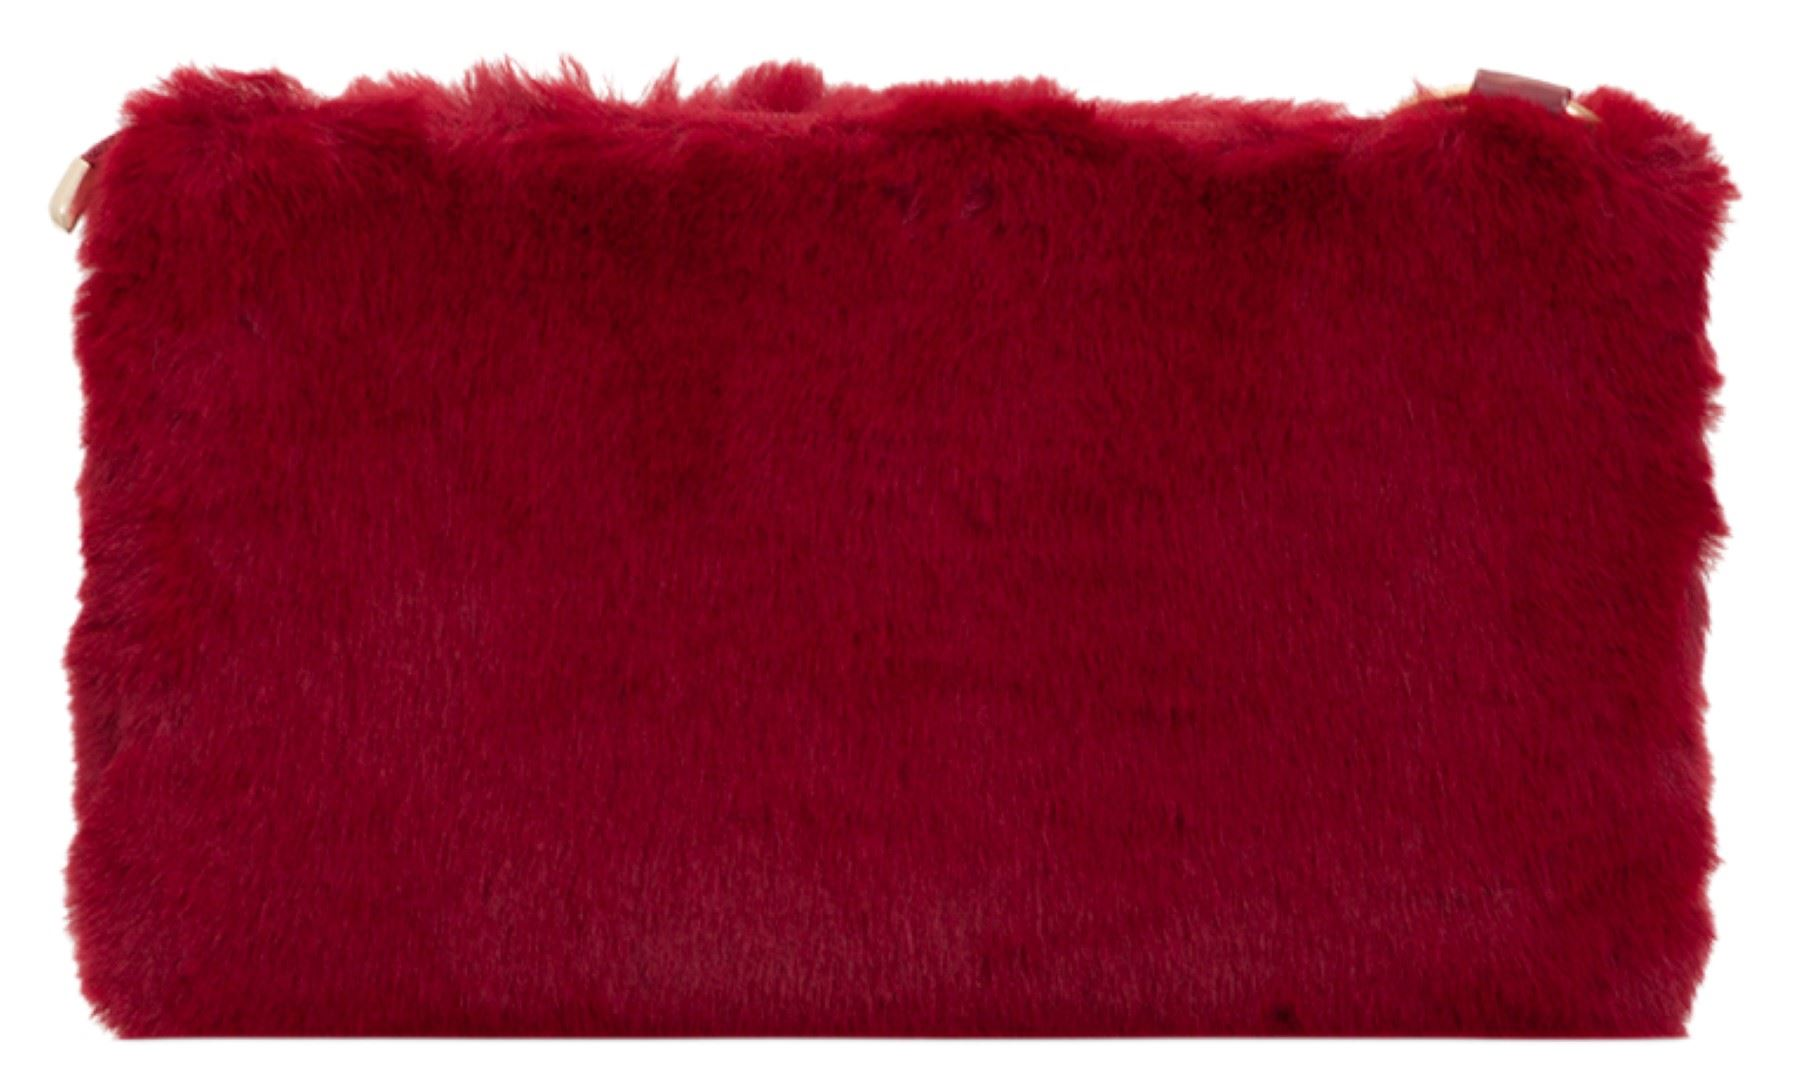 37ced5f63d Winter Ladies Faux Fur Clutch Bag Plain Handbag Top Zipped Stylish ...